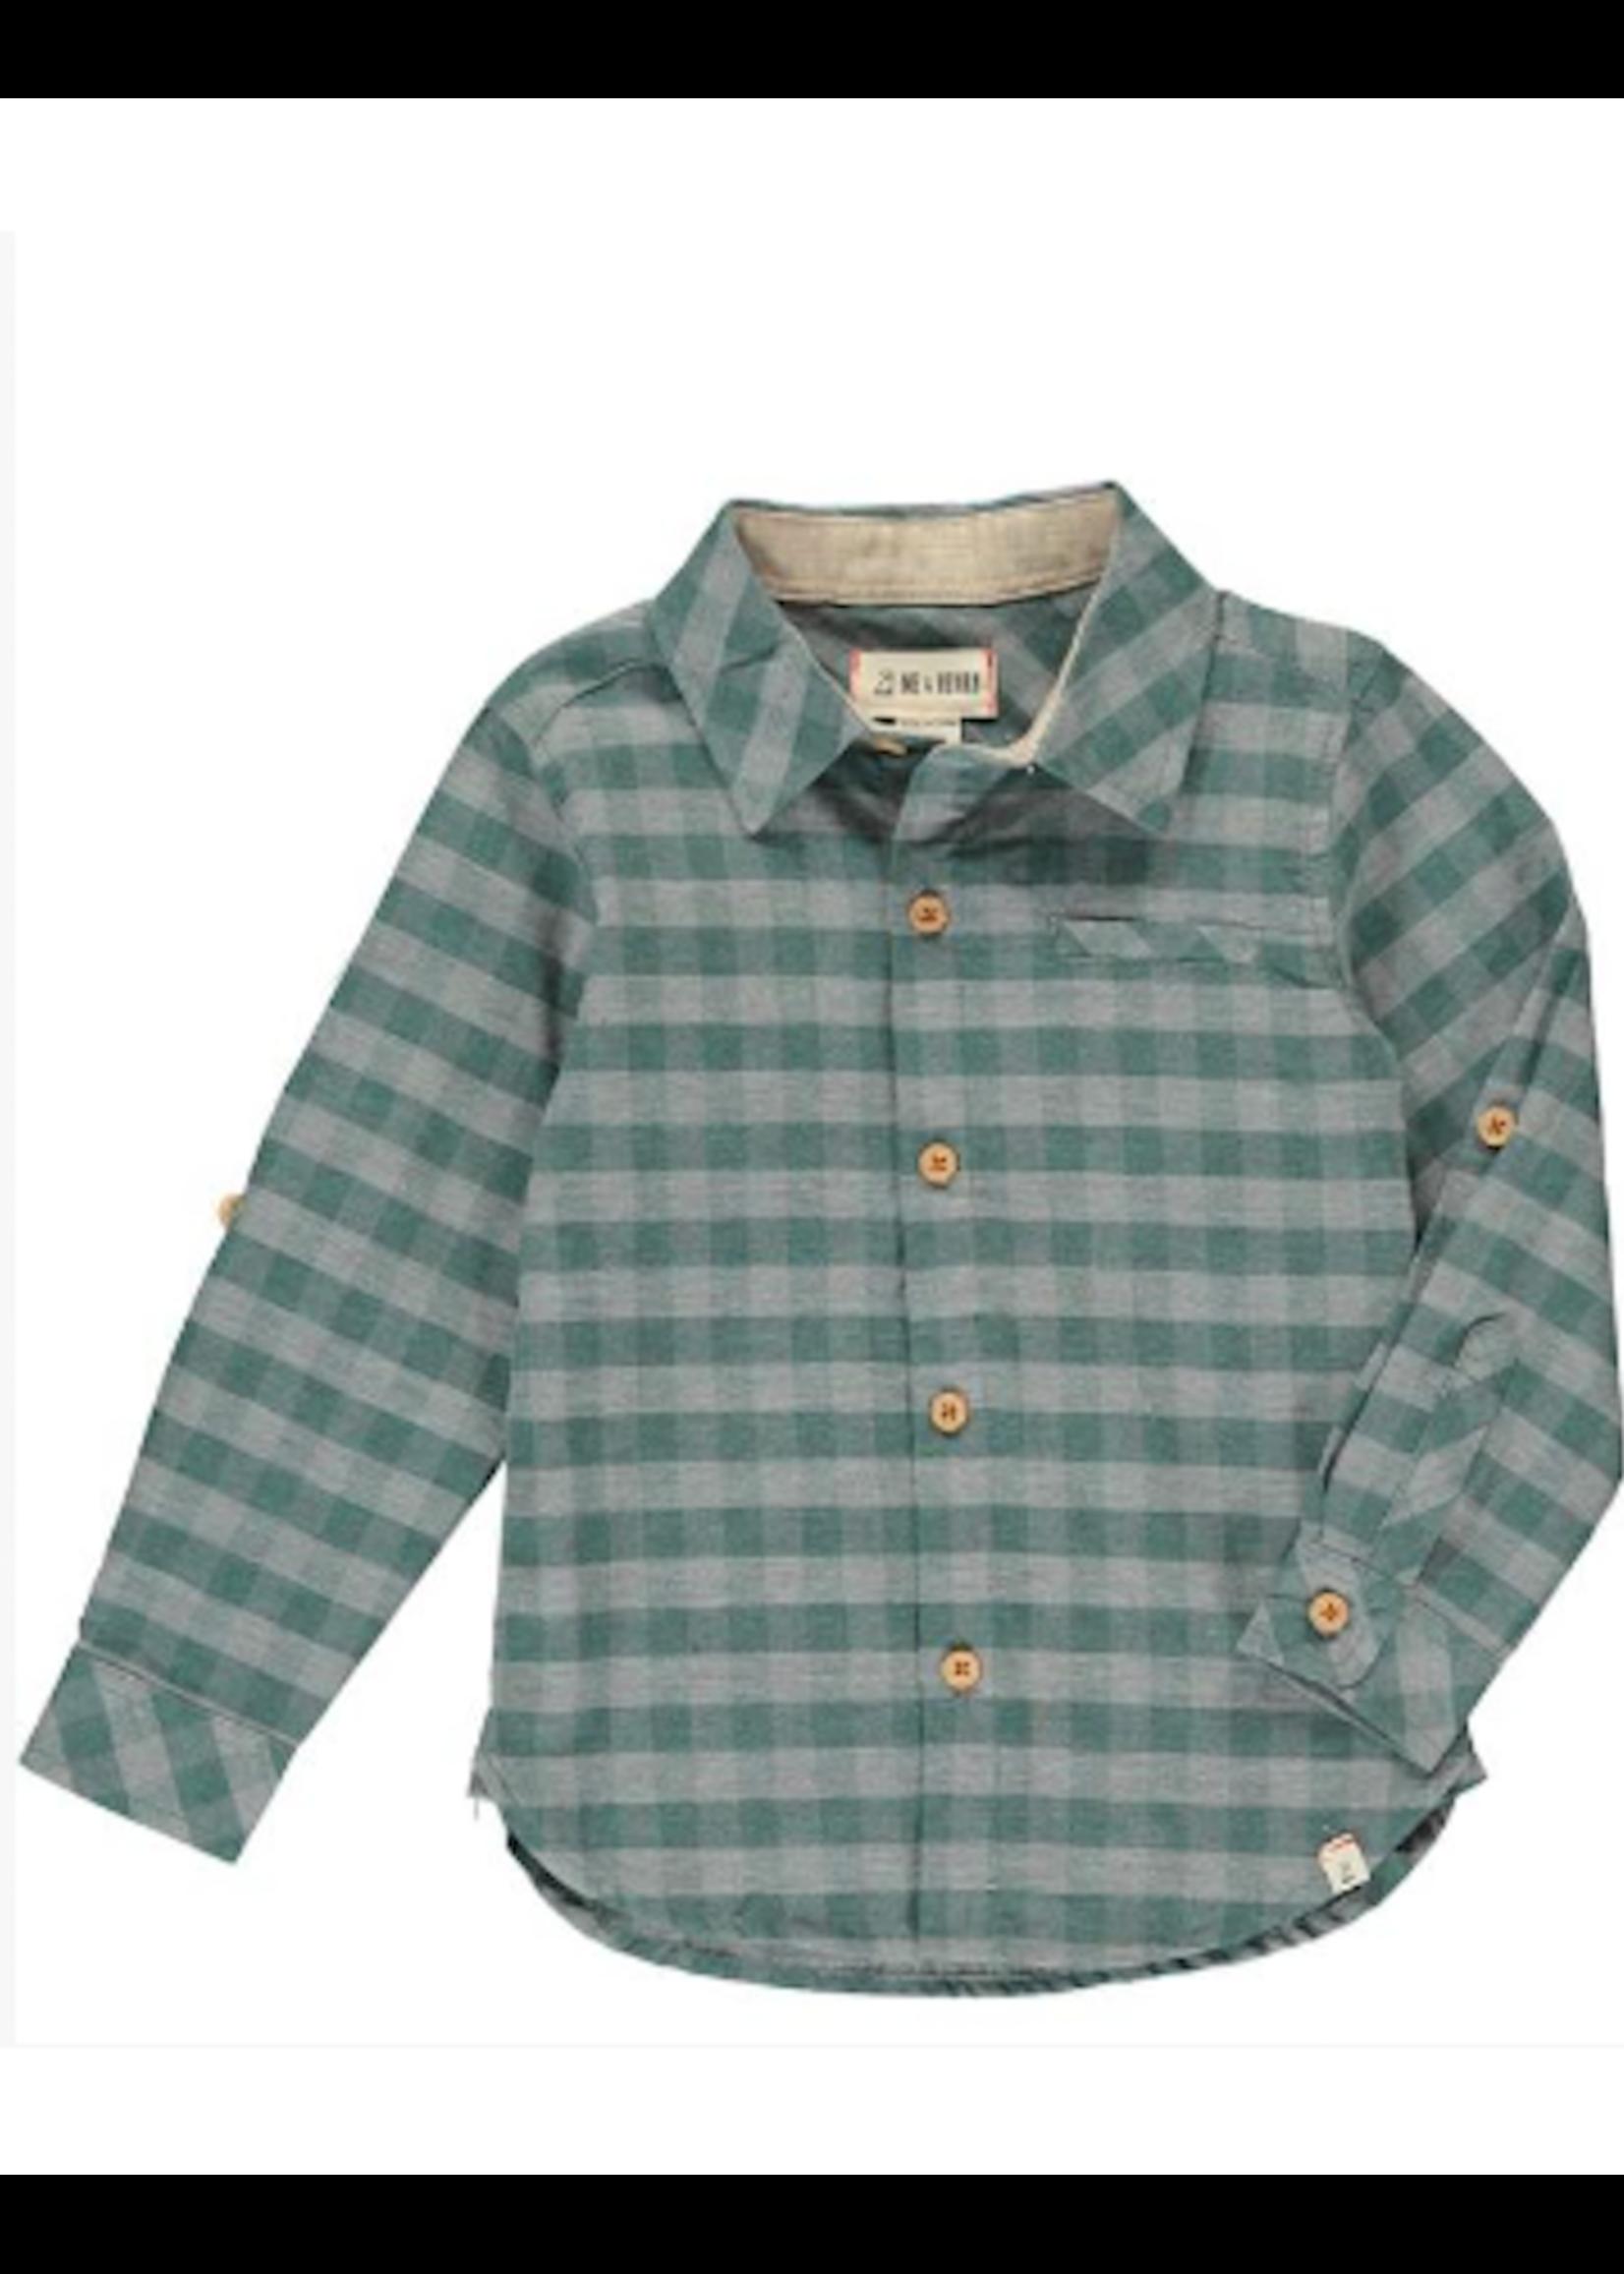 Me & Henry Me & Henry, Green/Grey Plaid Shirt